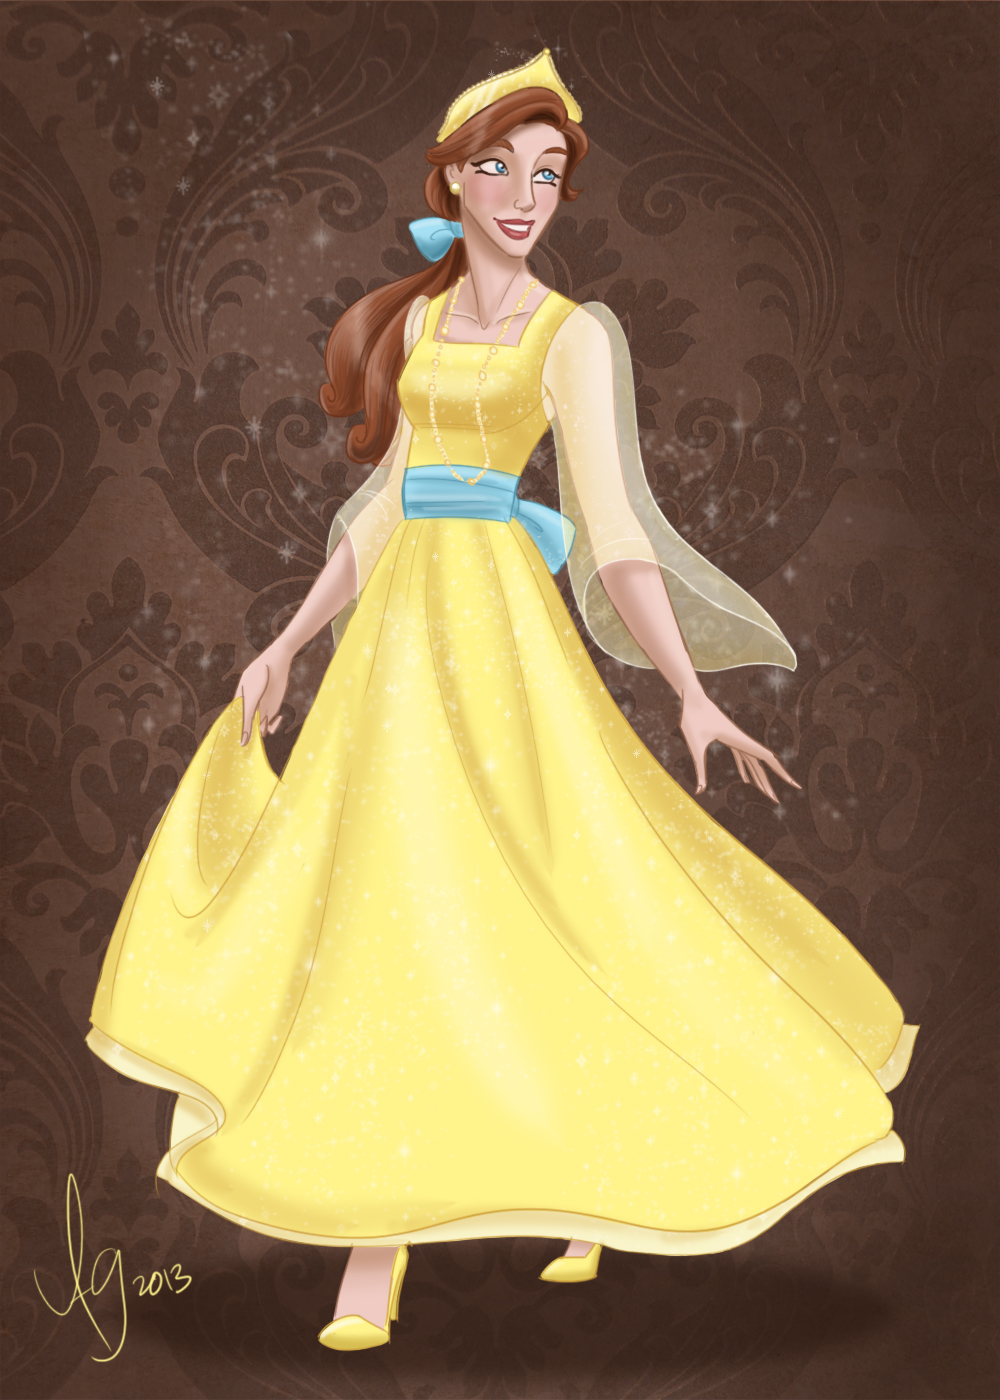 Coloriage princesse anastasia à imprimer